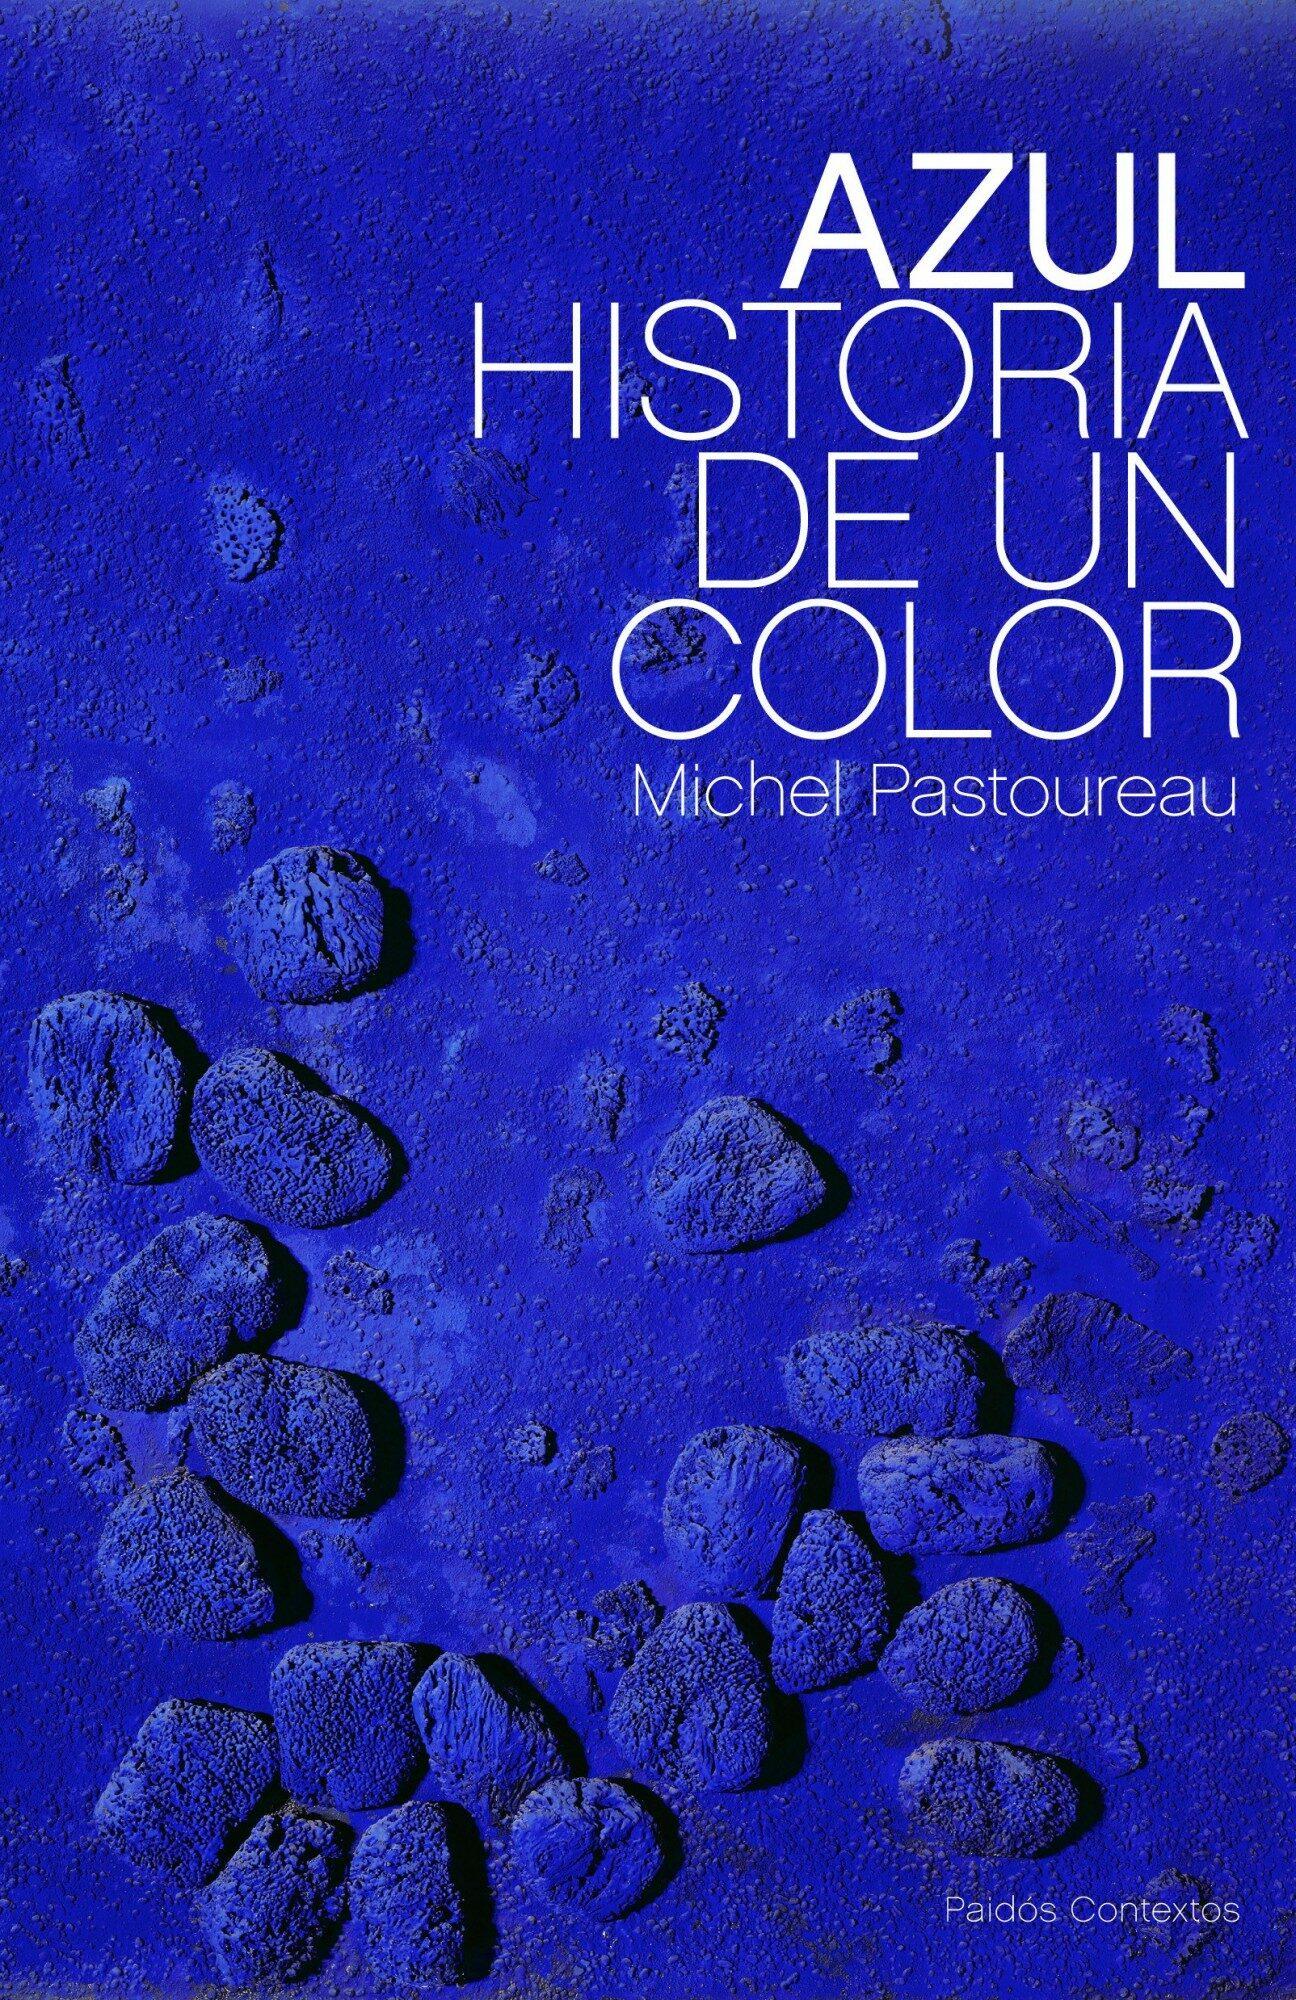 AZUL: HISTORIA DE UN COLOR | MICHEL PASTOUREAU | Comprar libro ...